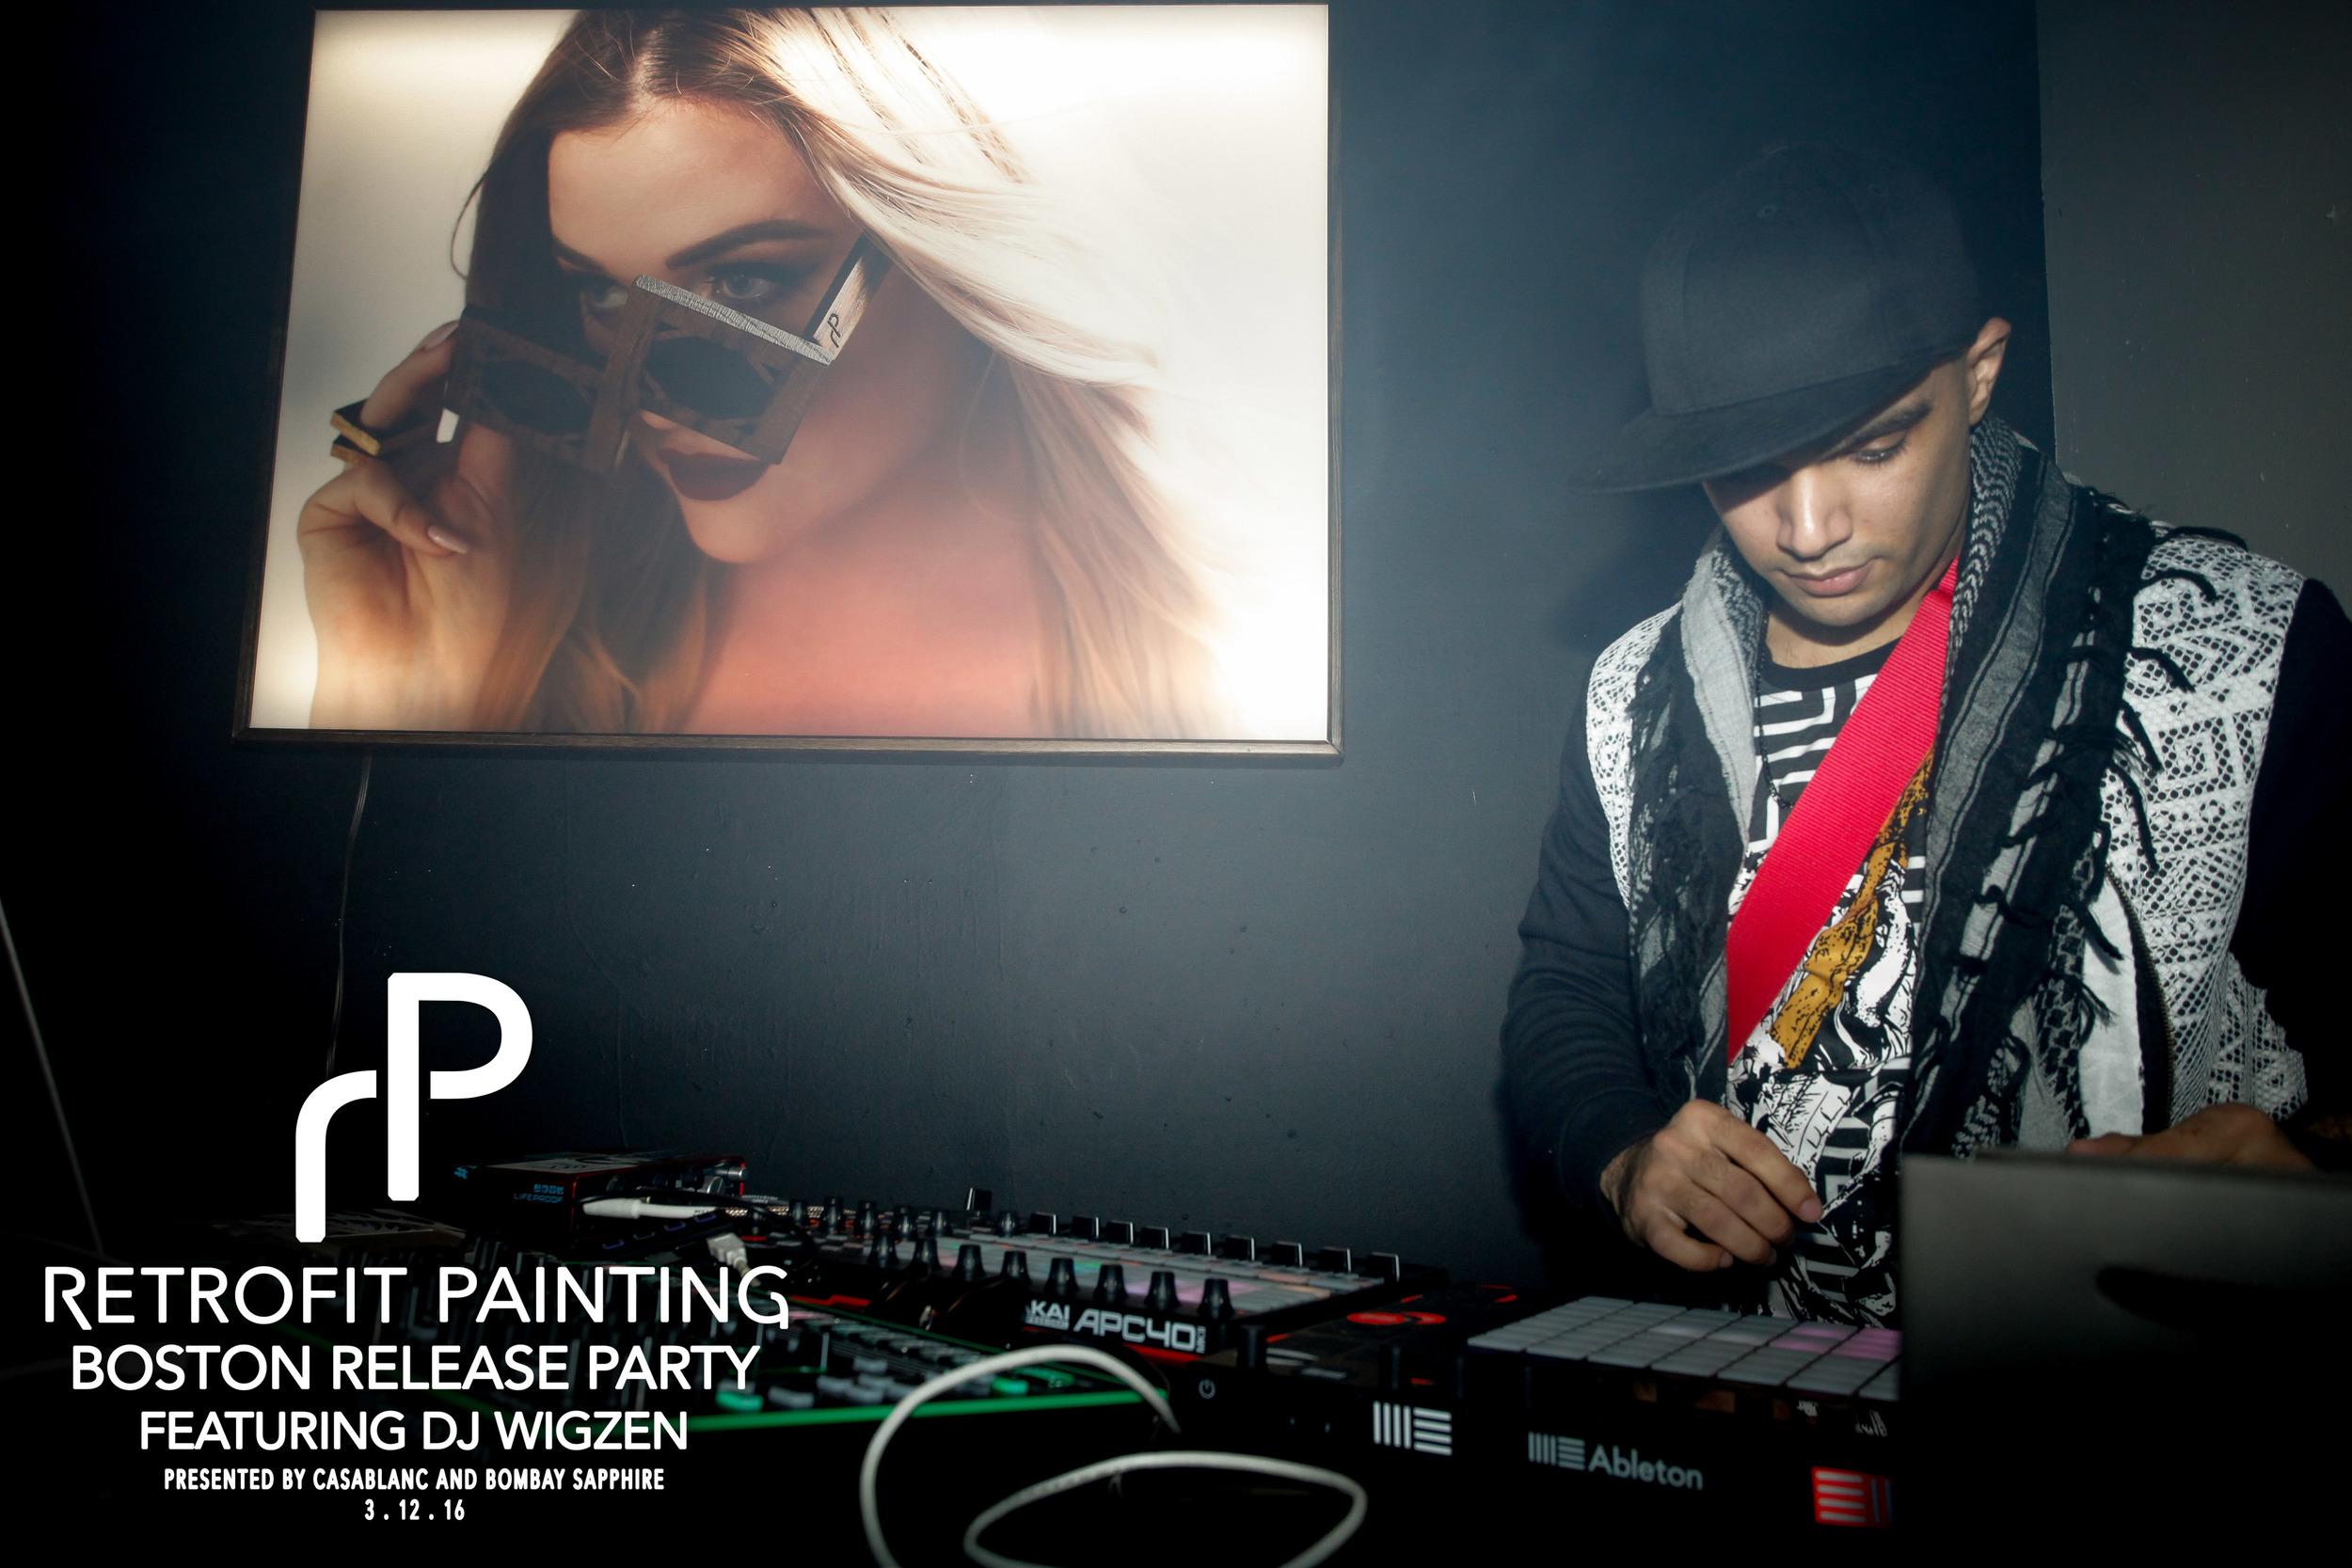 Retrofit Painting Boston Release Party 0026.jpg